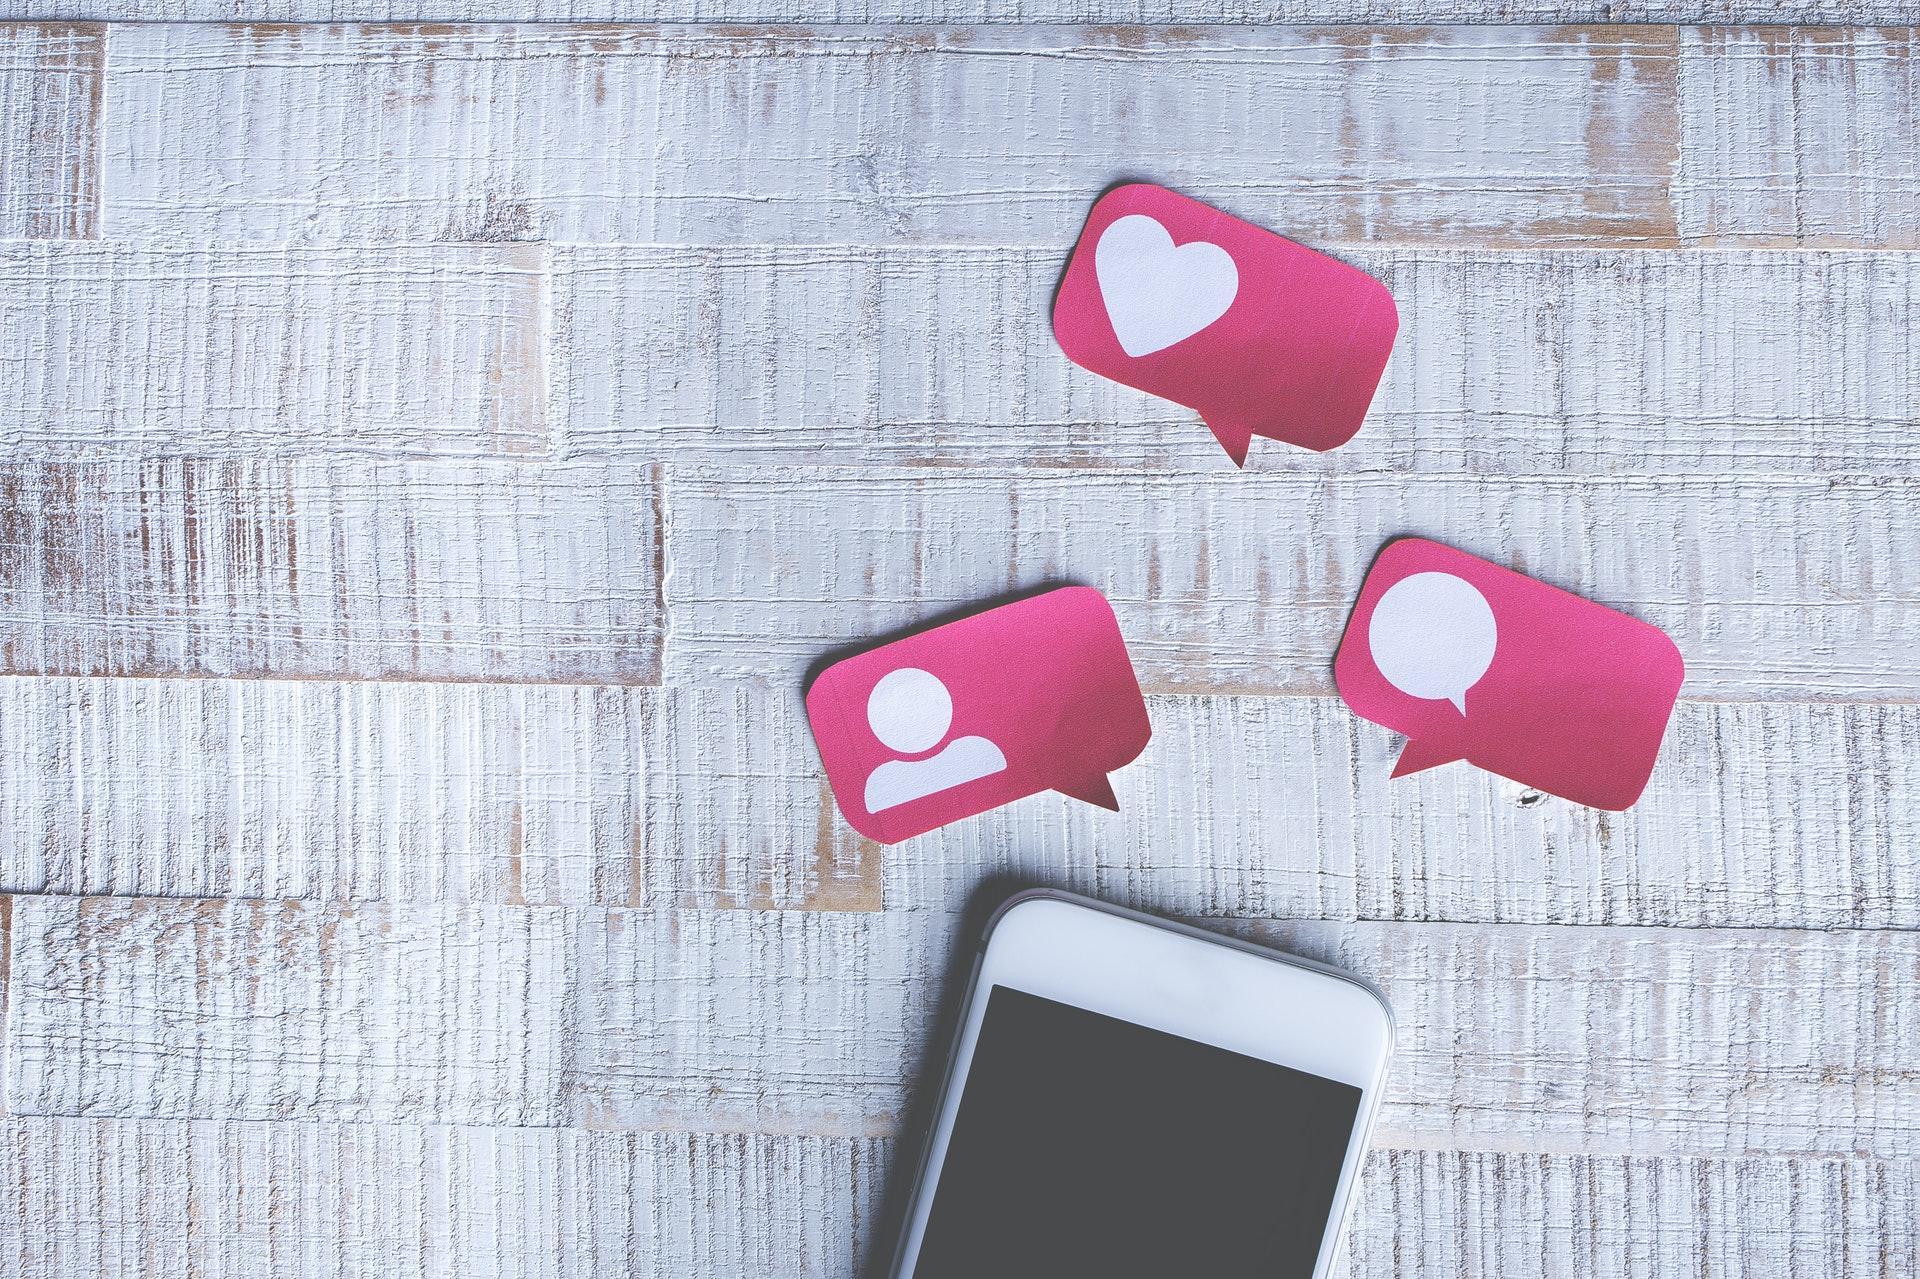 Tarefas para gerir redes sociais